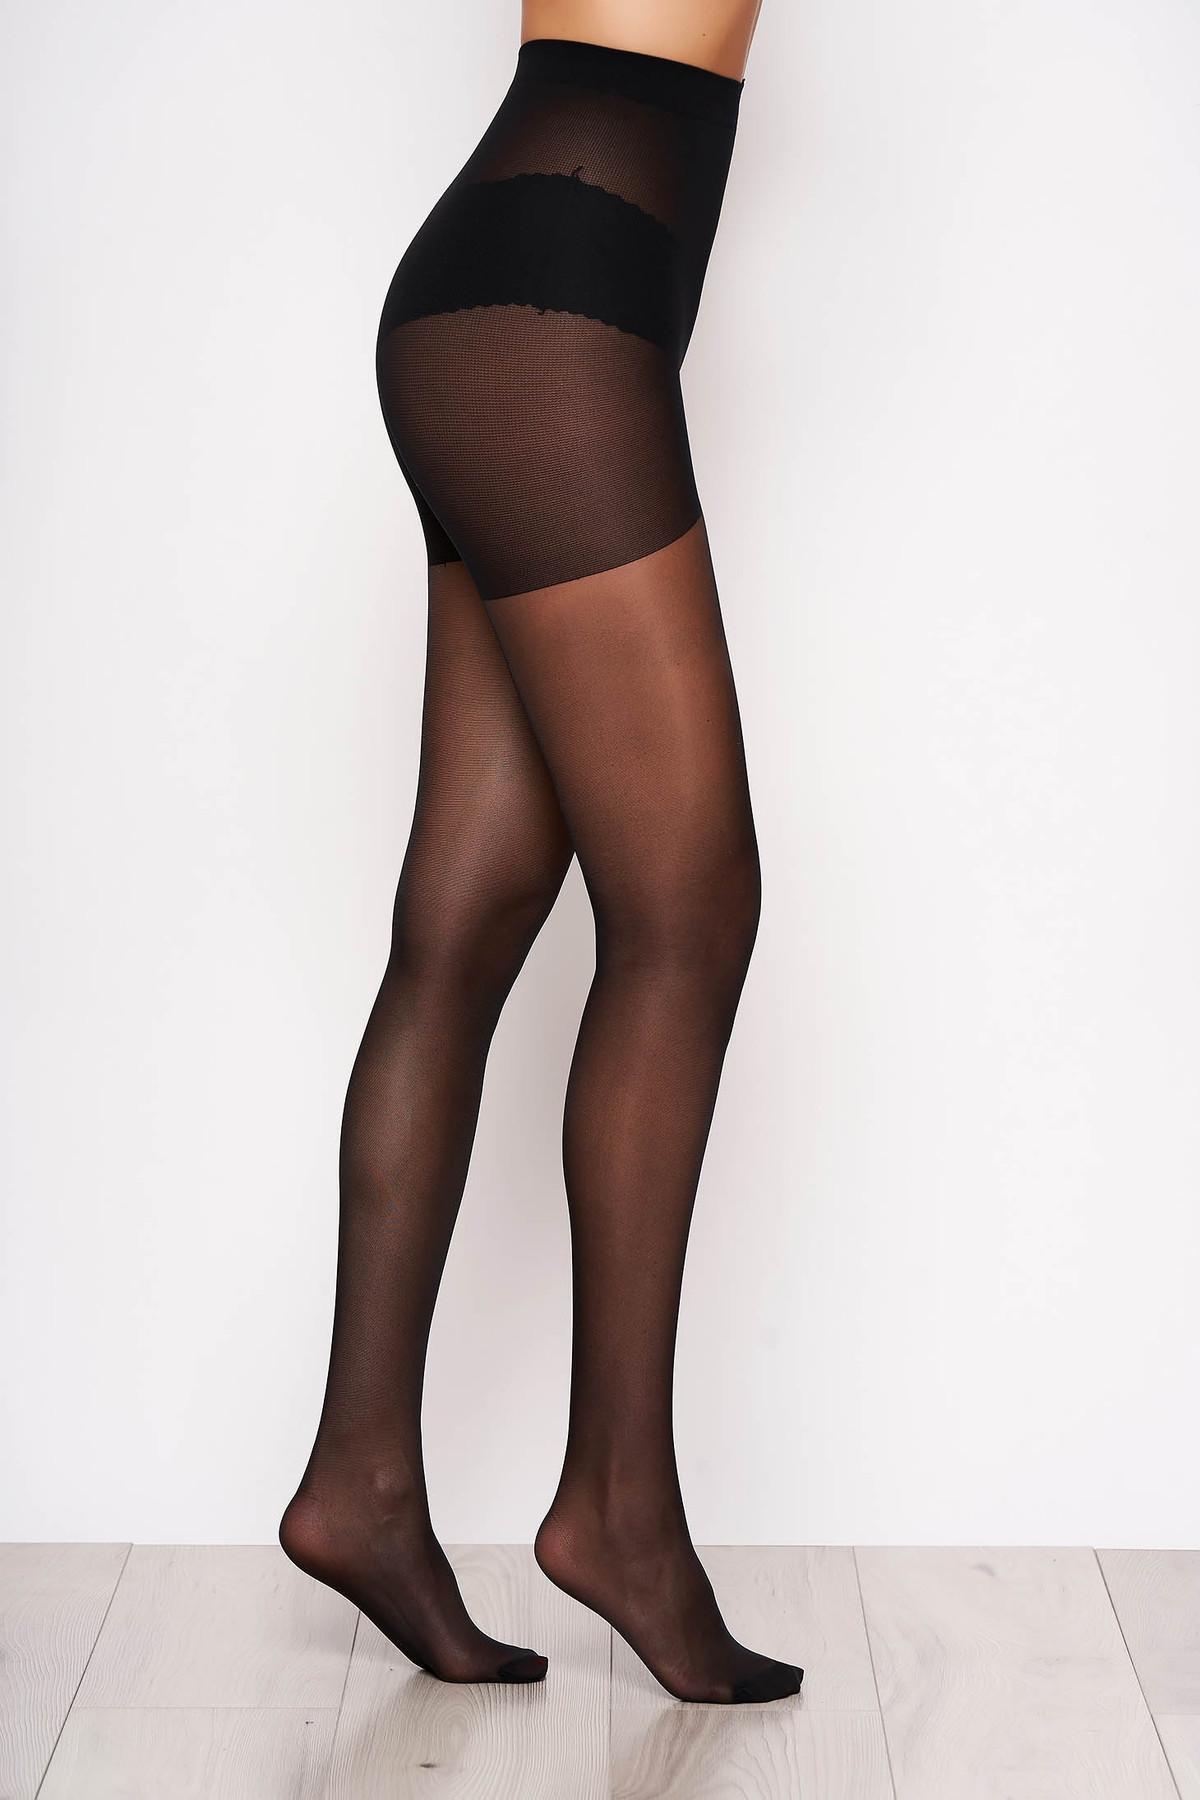 Dres dama negru modelator 20 den cu banda anti-alunecare